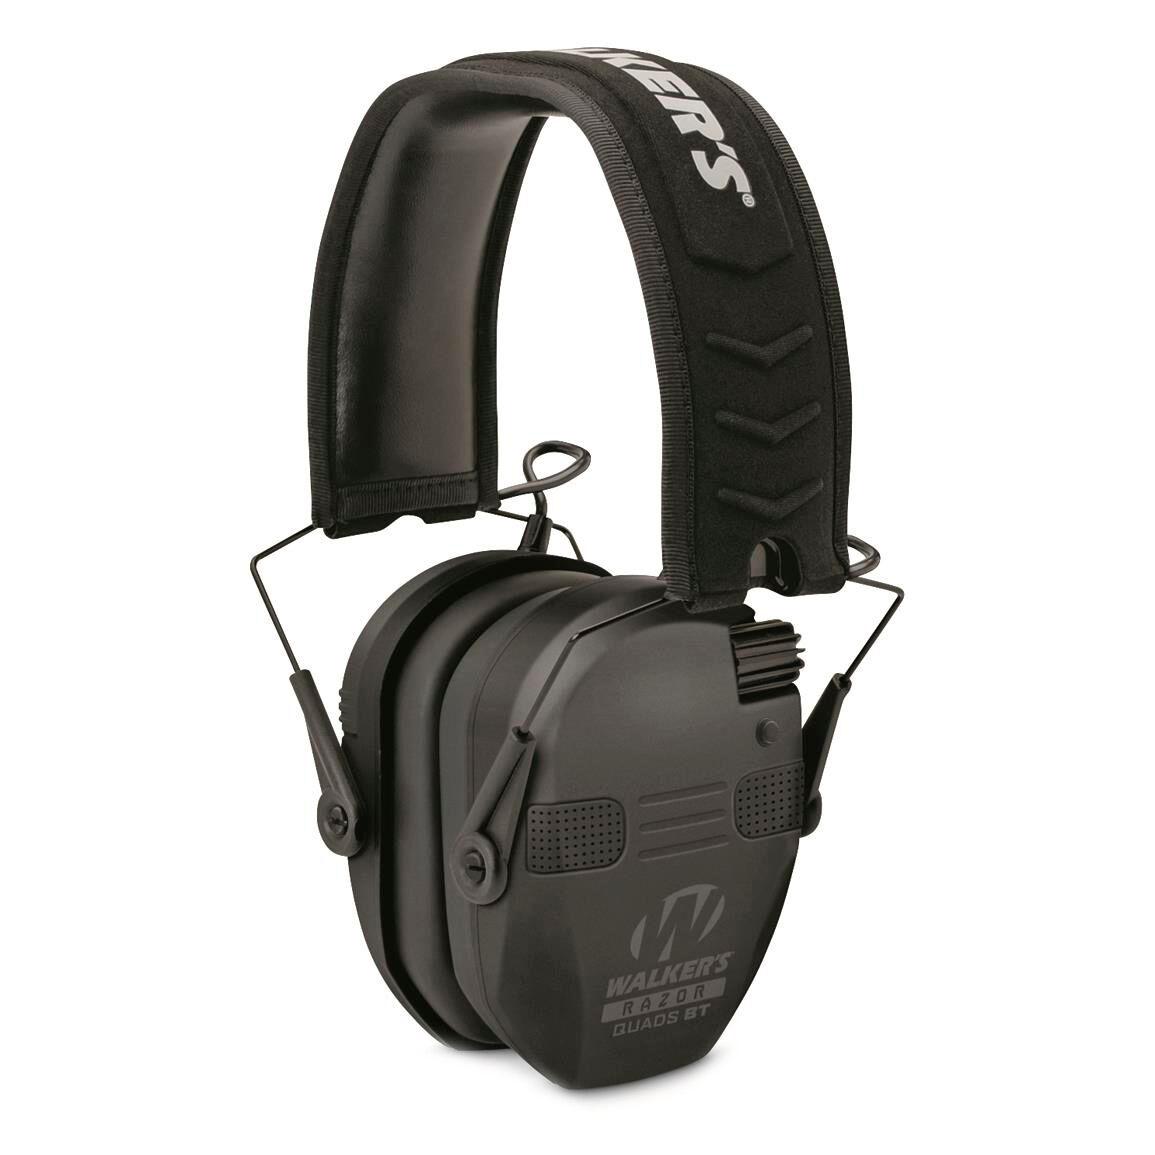 Walker's Razor Slim Electronic Quad Bluetooth Earmuff